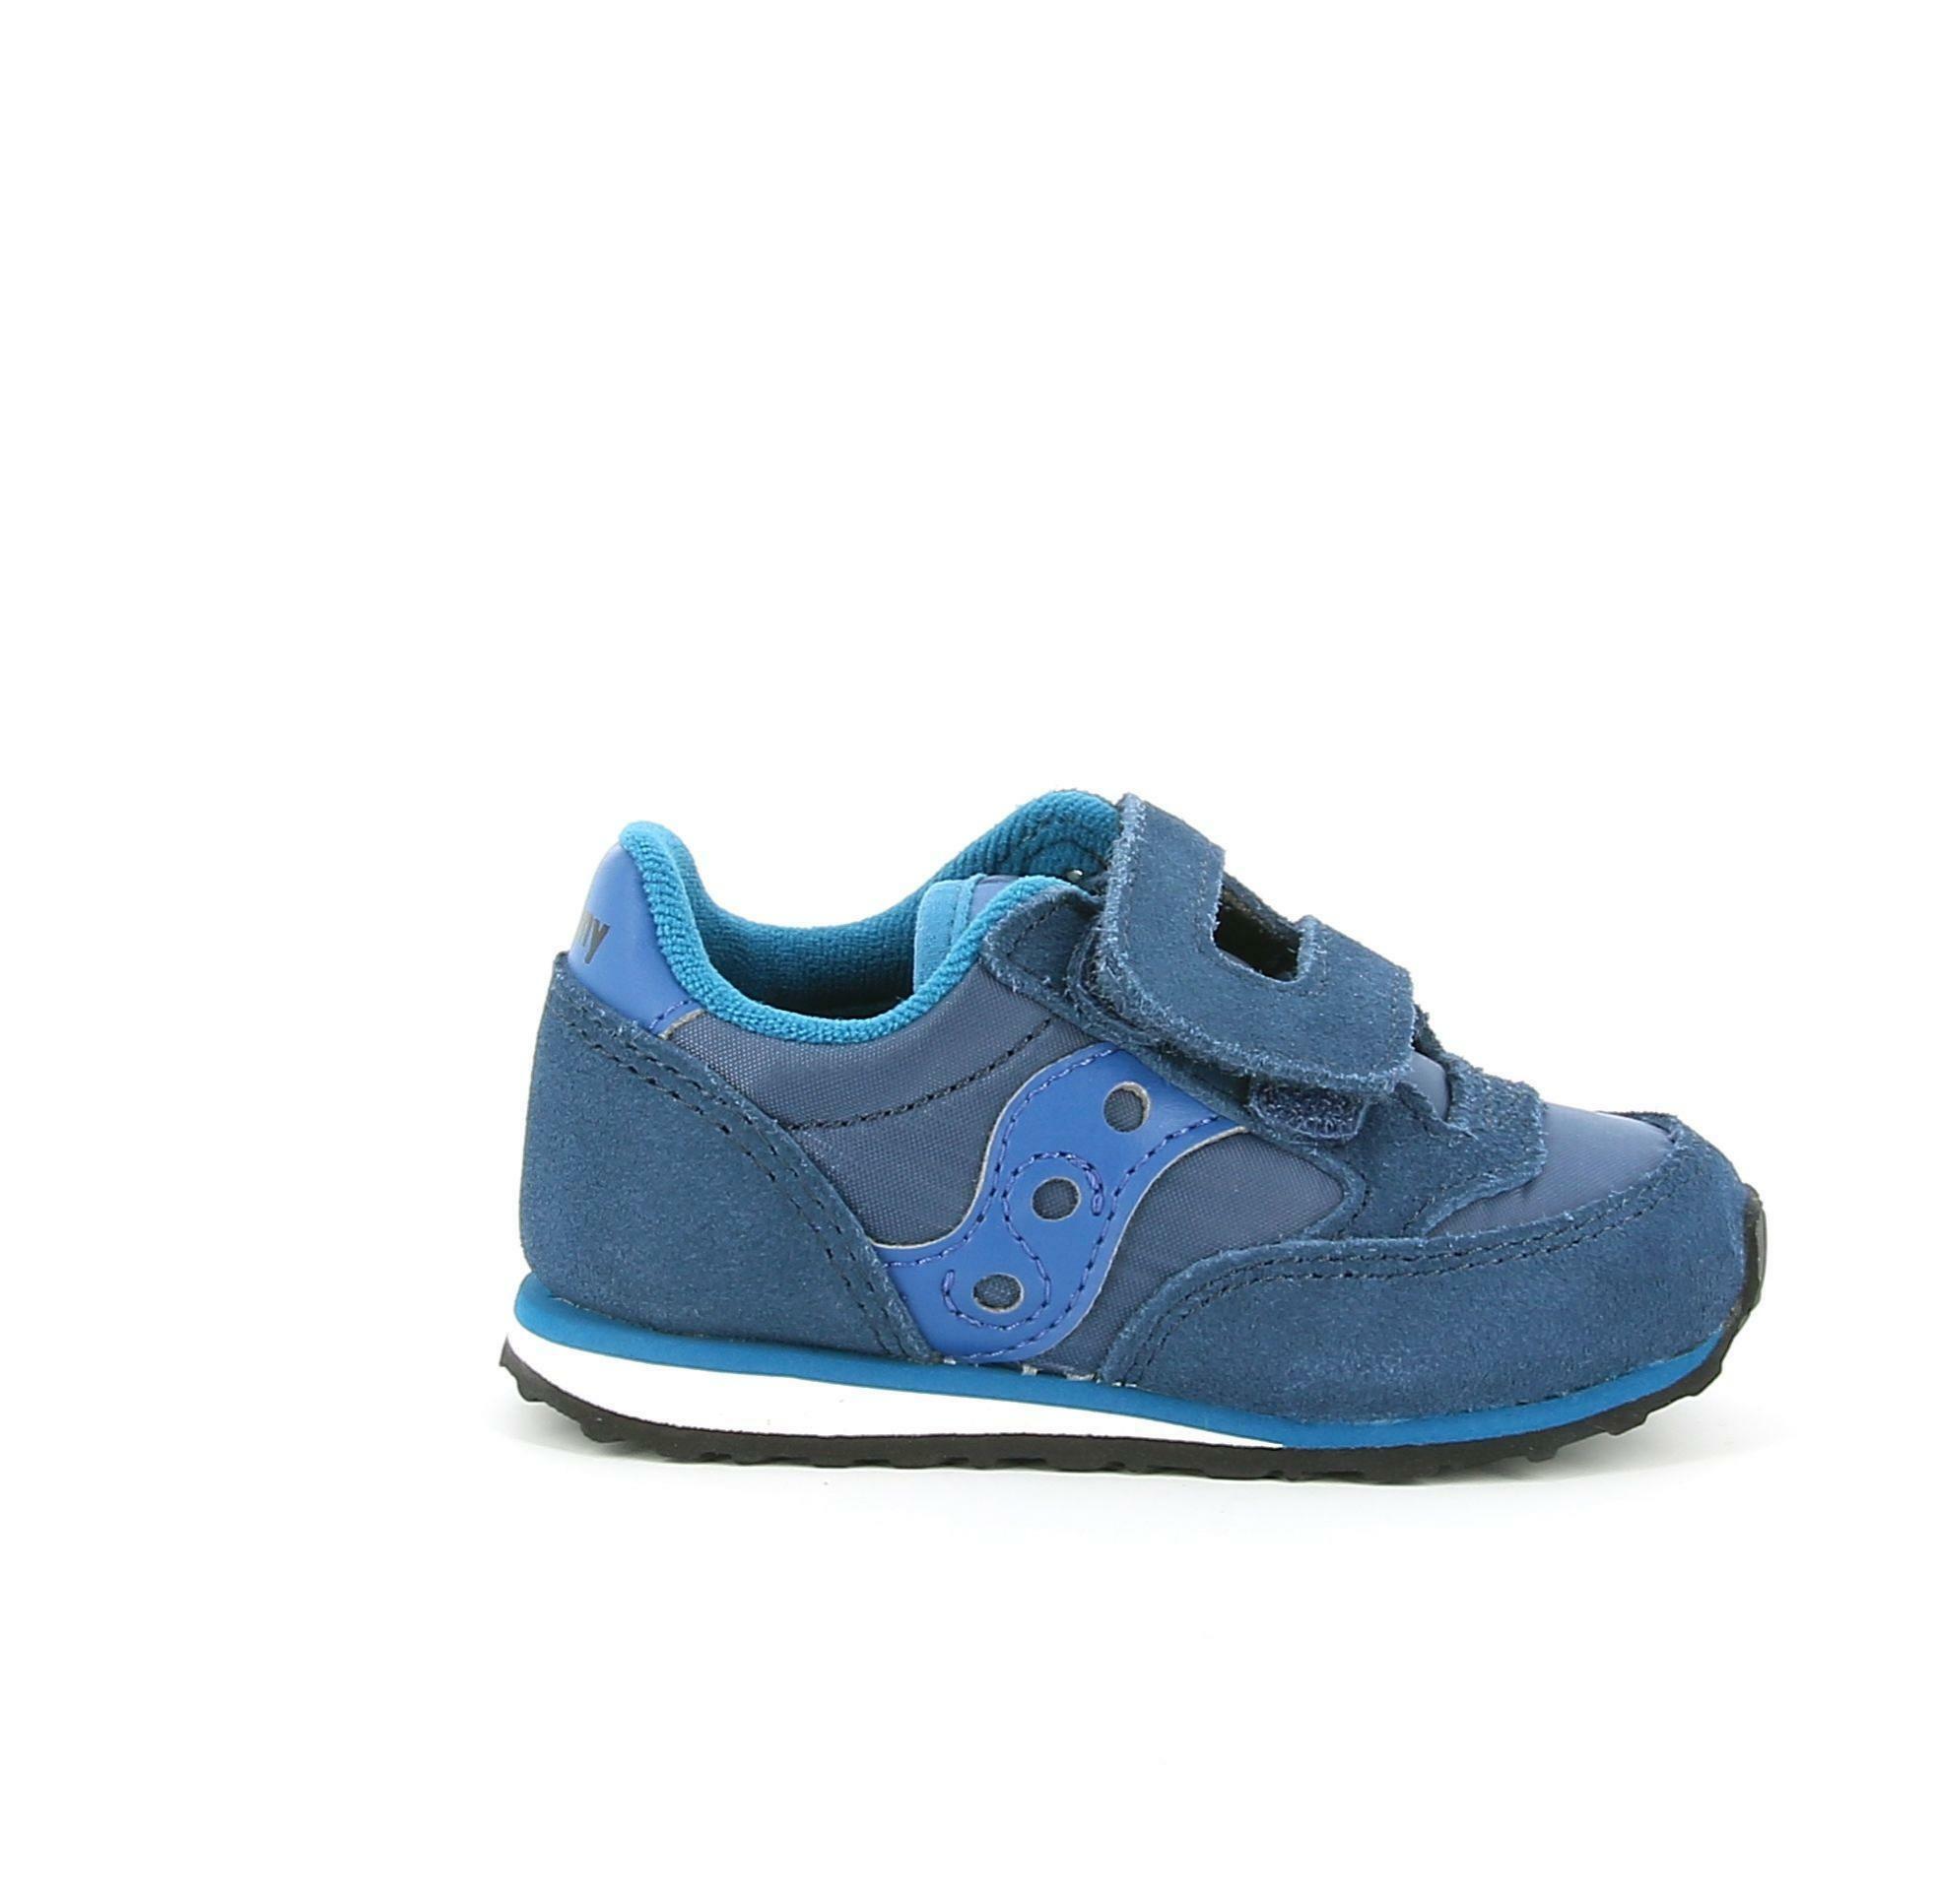 saucony saucony jazz hl baby scarpe da ginnastica unisex-bambini sl263374